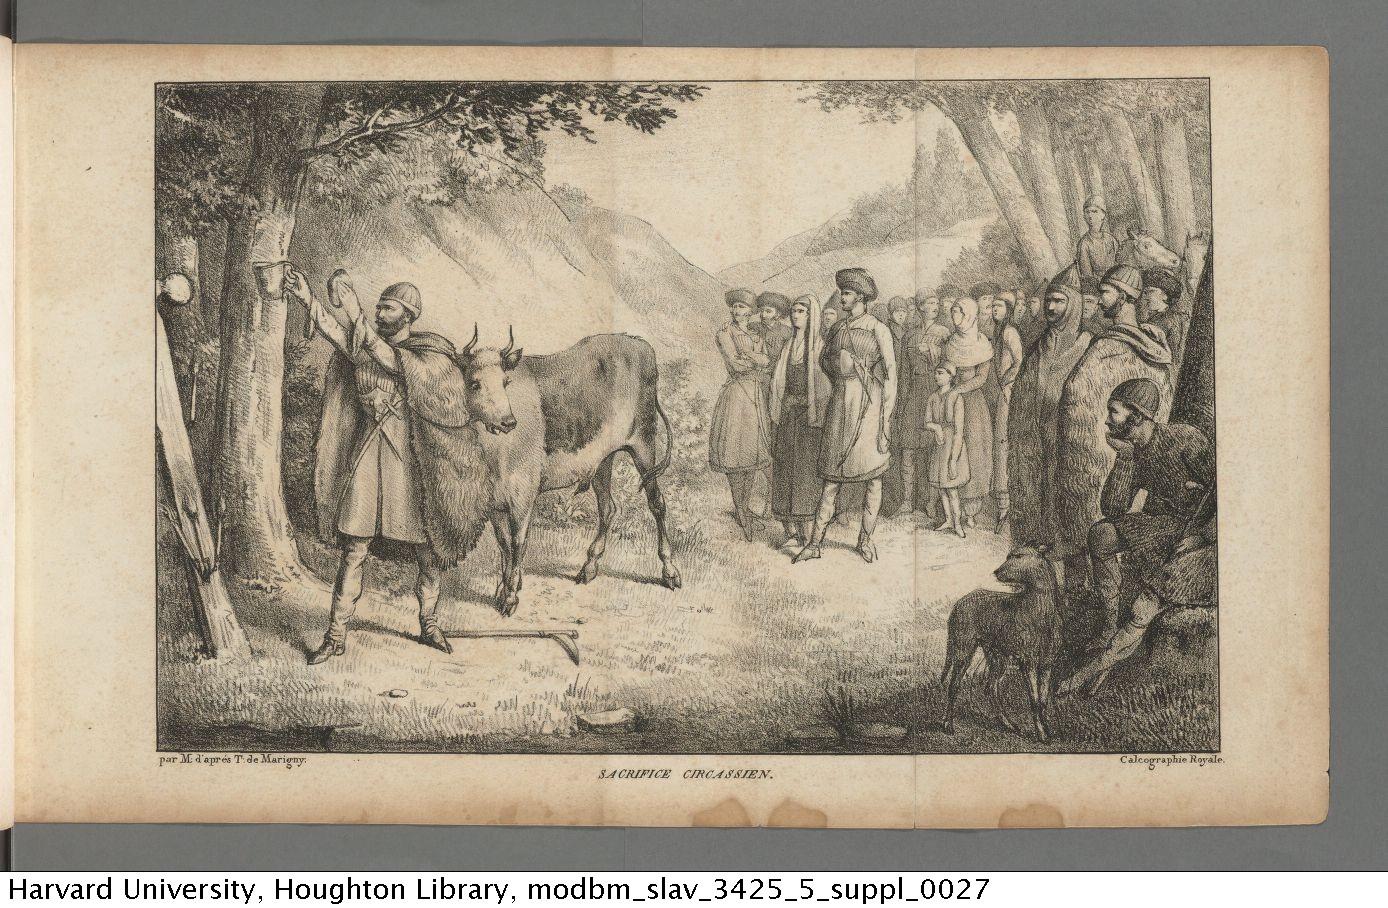 Taitbout de Marigny, Edouard, chevalier. <em>Voyage en Circassie</em>, 1821. Slav 3425.2.5* Suppl.